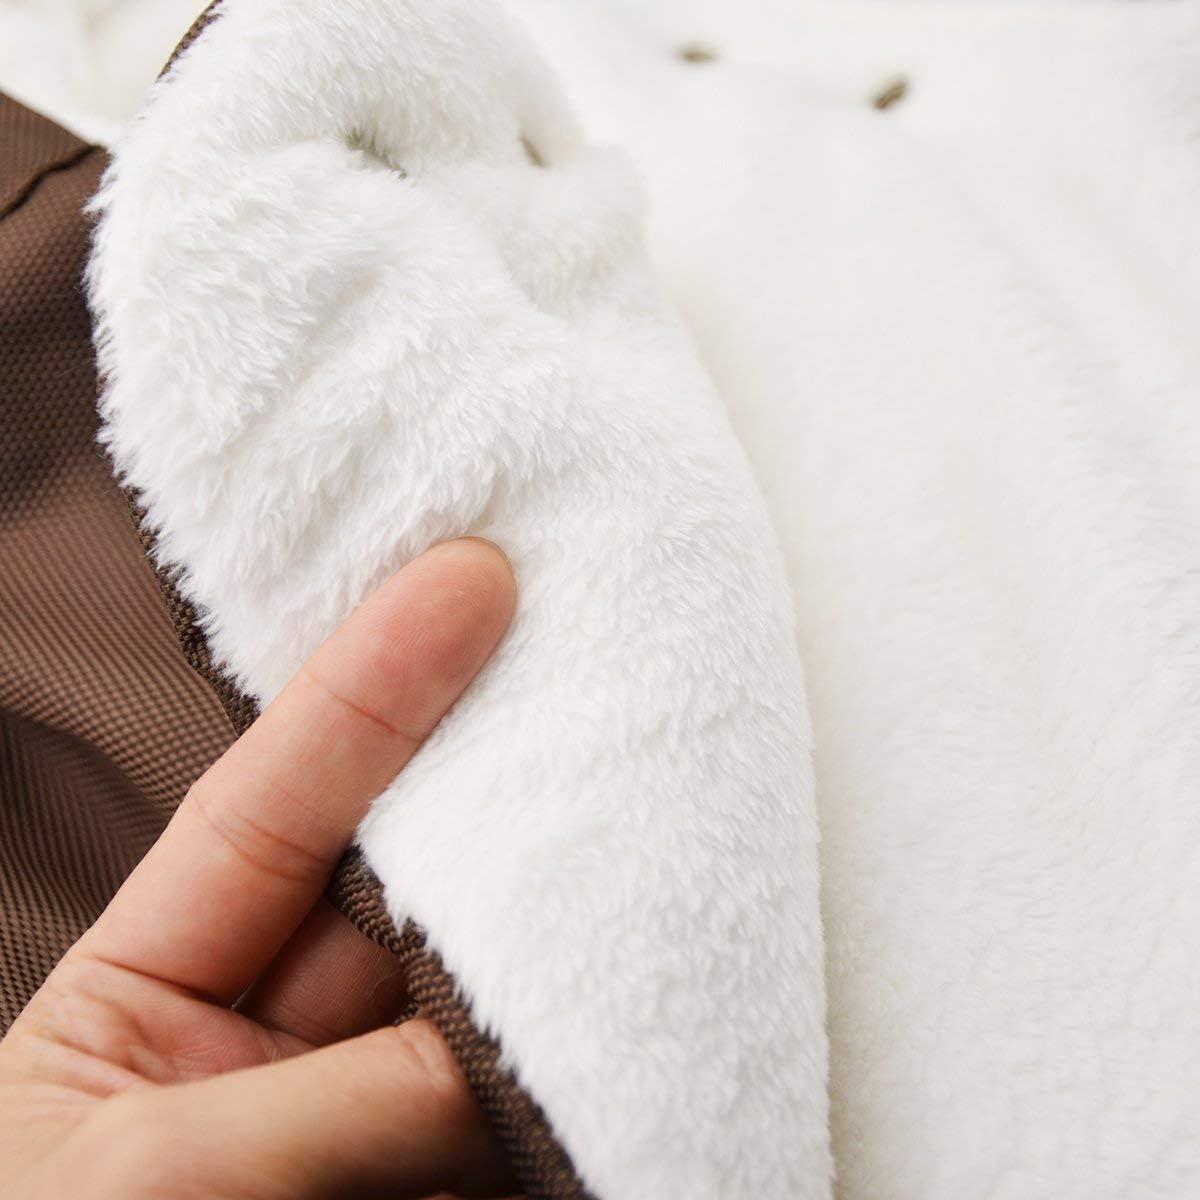 Pushchair Pram Gloves YAHUANG Detachable Winter Pram Stroller Hand Warmer Hand Muffs